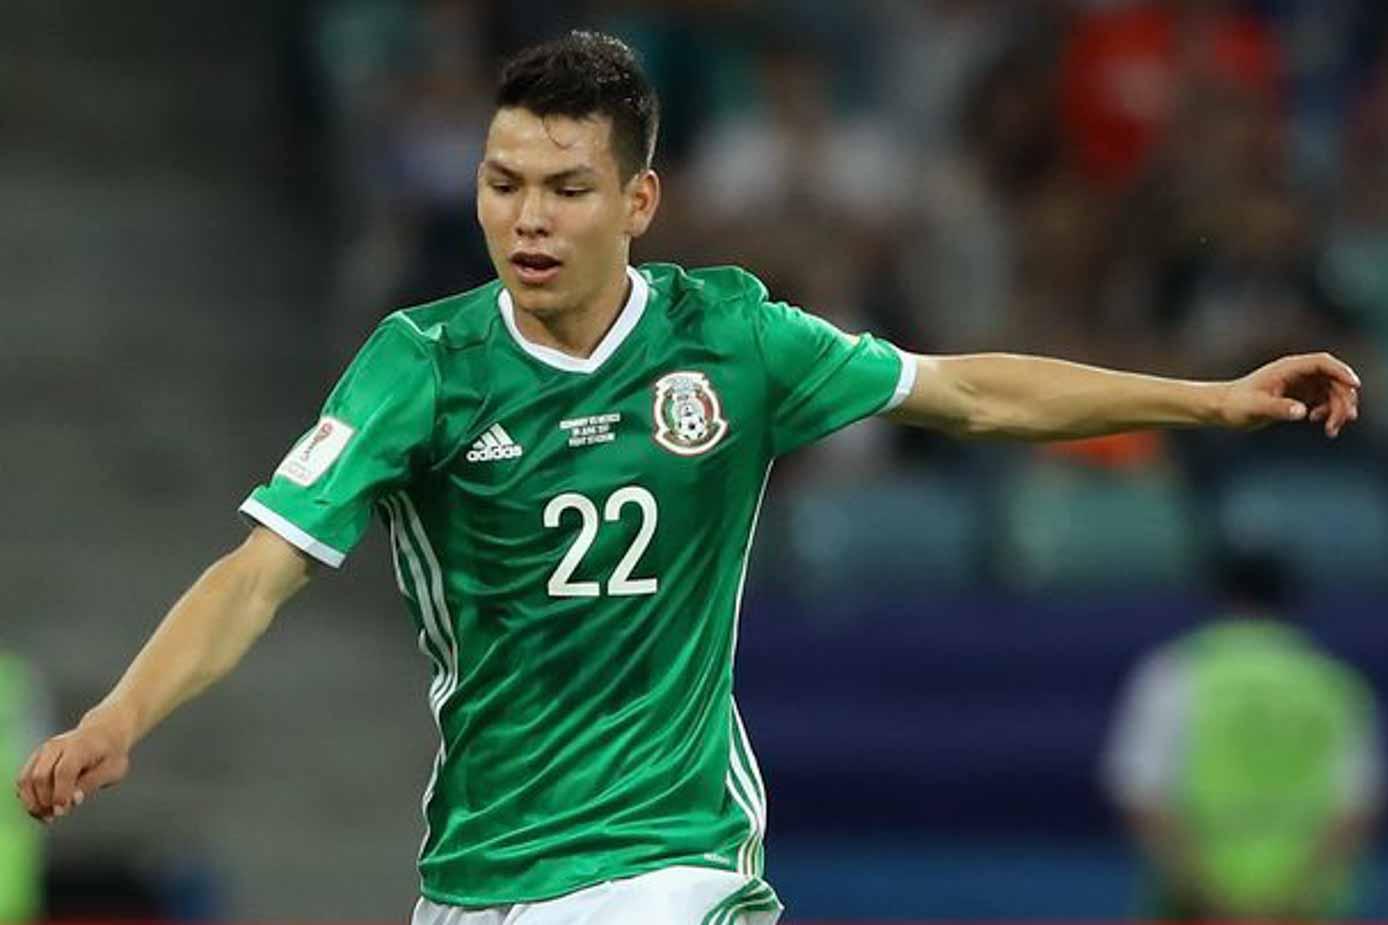 fce64bf32 Hirving Lozano Jersey - Mexico and PSV - SoccerPro.com